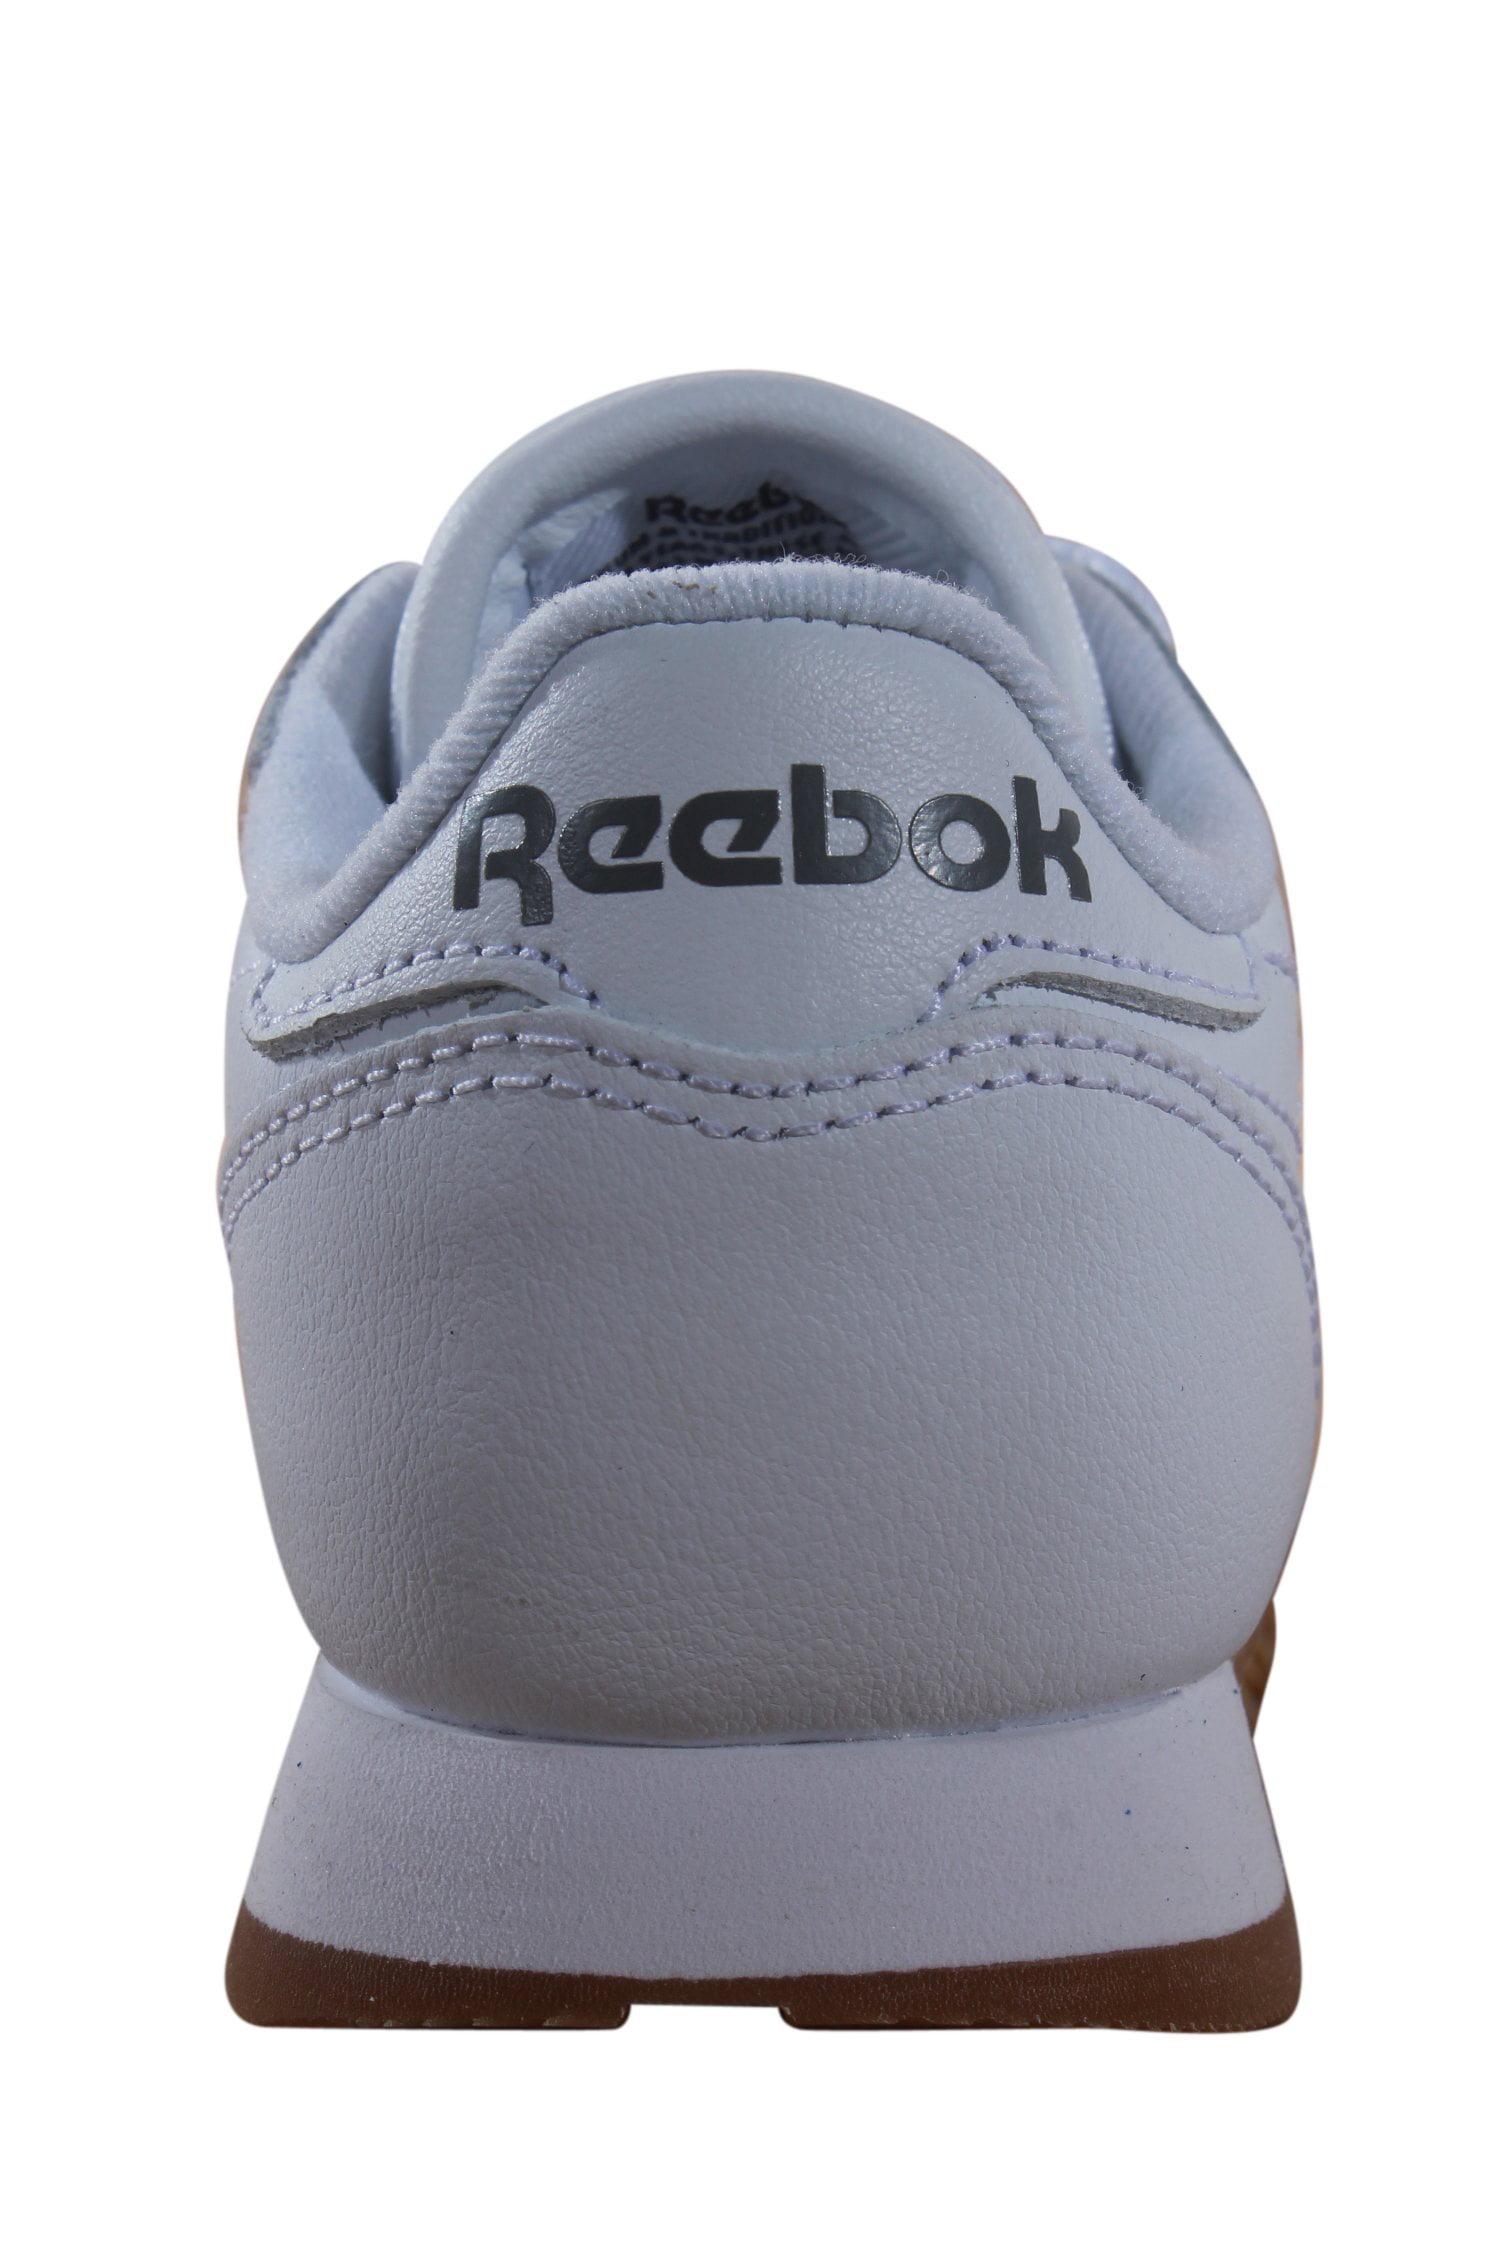 Reebok V69622 Kids Unisex Classic Leather Sneaker 12 Little Kid